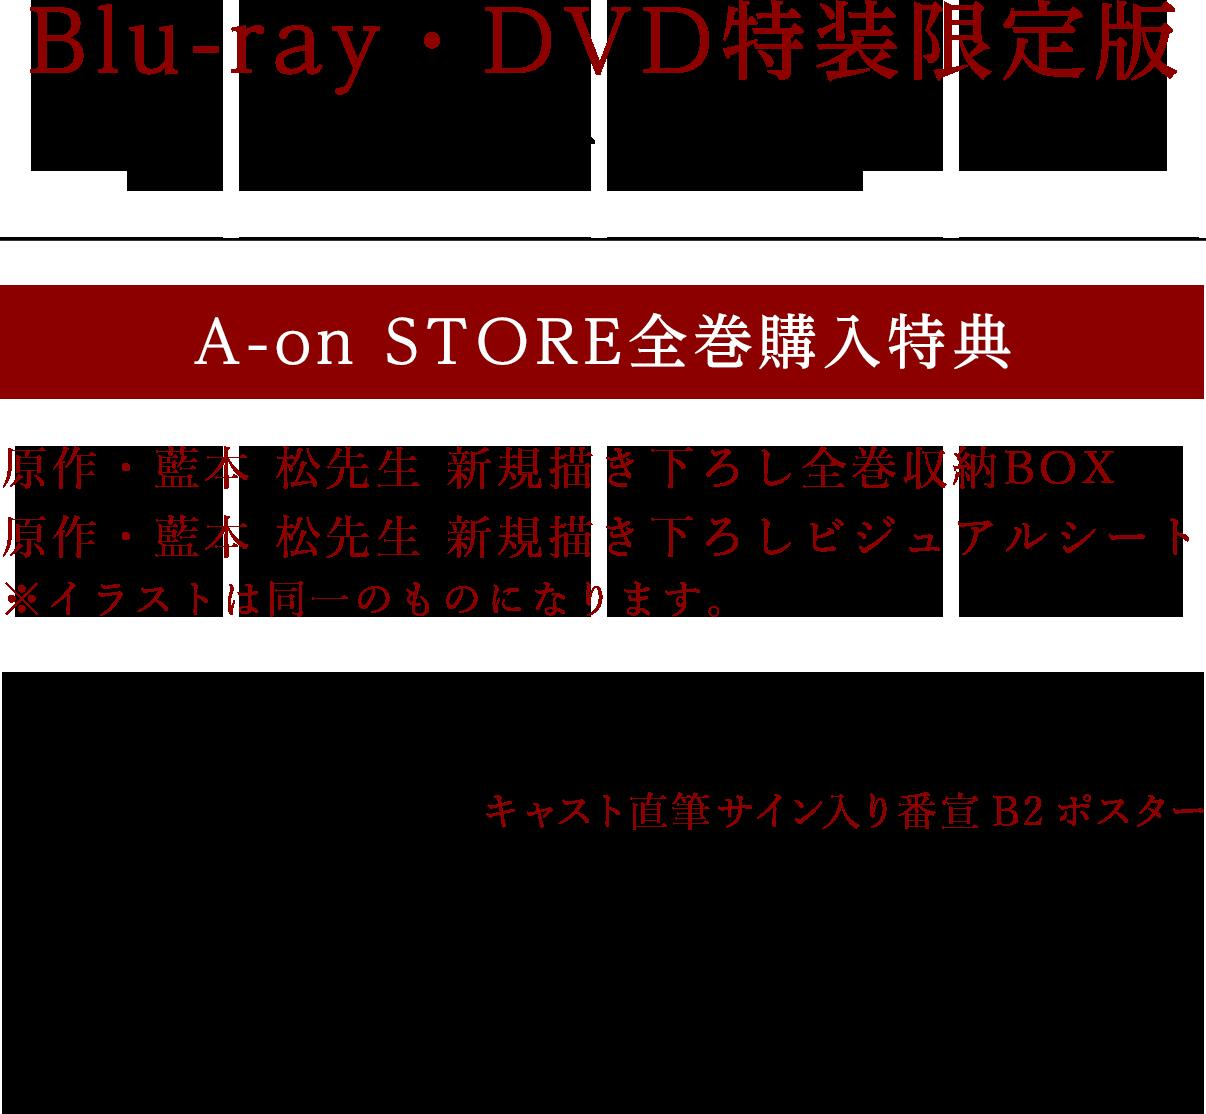 Blu-ray・DVD特装限定版予約受付中! A-on STORE全巻購入特典 原作・藍本 松先生 新規描き下ろし全巻収納BOX原作・藍本 松先生 新規描き下ろしビジュアルシート※イラストは同一のものになります。<Blu-ray・DVD第1巻 発売記念抽選キャンペーン>対象期間内に「怪物事変」Blu-ray・DVD第1巻をご購入いただいた方の中から抽選で、キャスト直筆サイン入り番宣B2ポスターをプレゼント!対象期間:2021年4月5日(月)まで賞品:キャスト直筆サイン入り番宣B2ポスター … 1名様(藤原夏海さん、諏訪部順一さん、花江夏樹さん、村瀬歩さん、小野大輔さん、花守ゆみりさん、花澤香菜さん、下野紘さん)